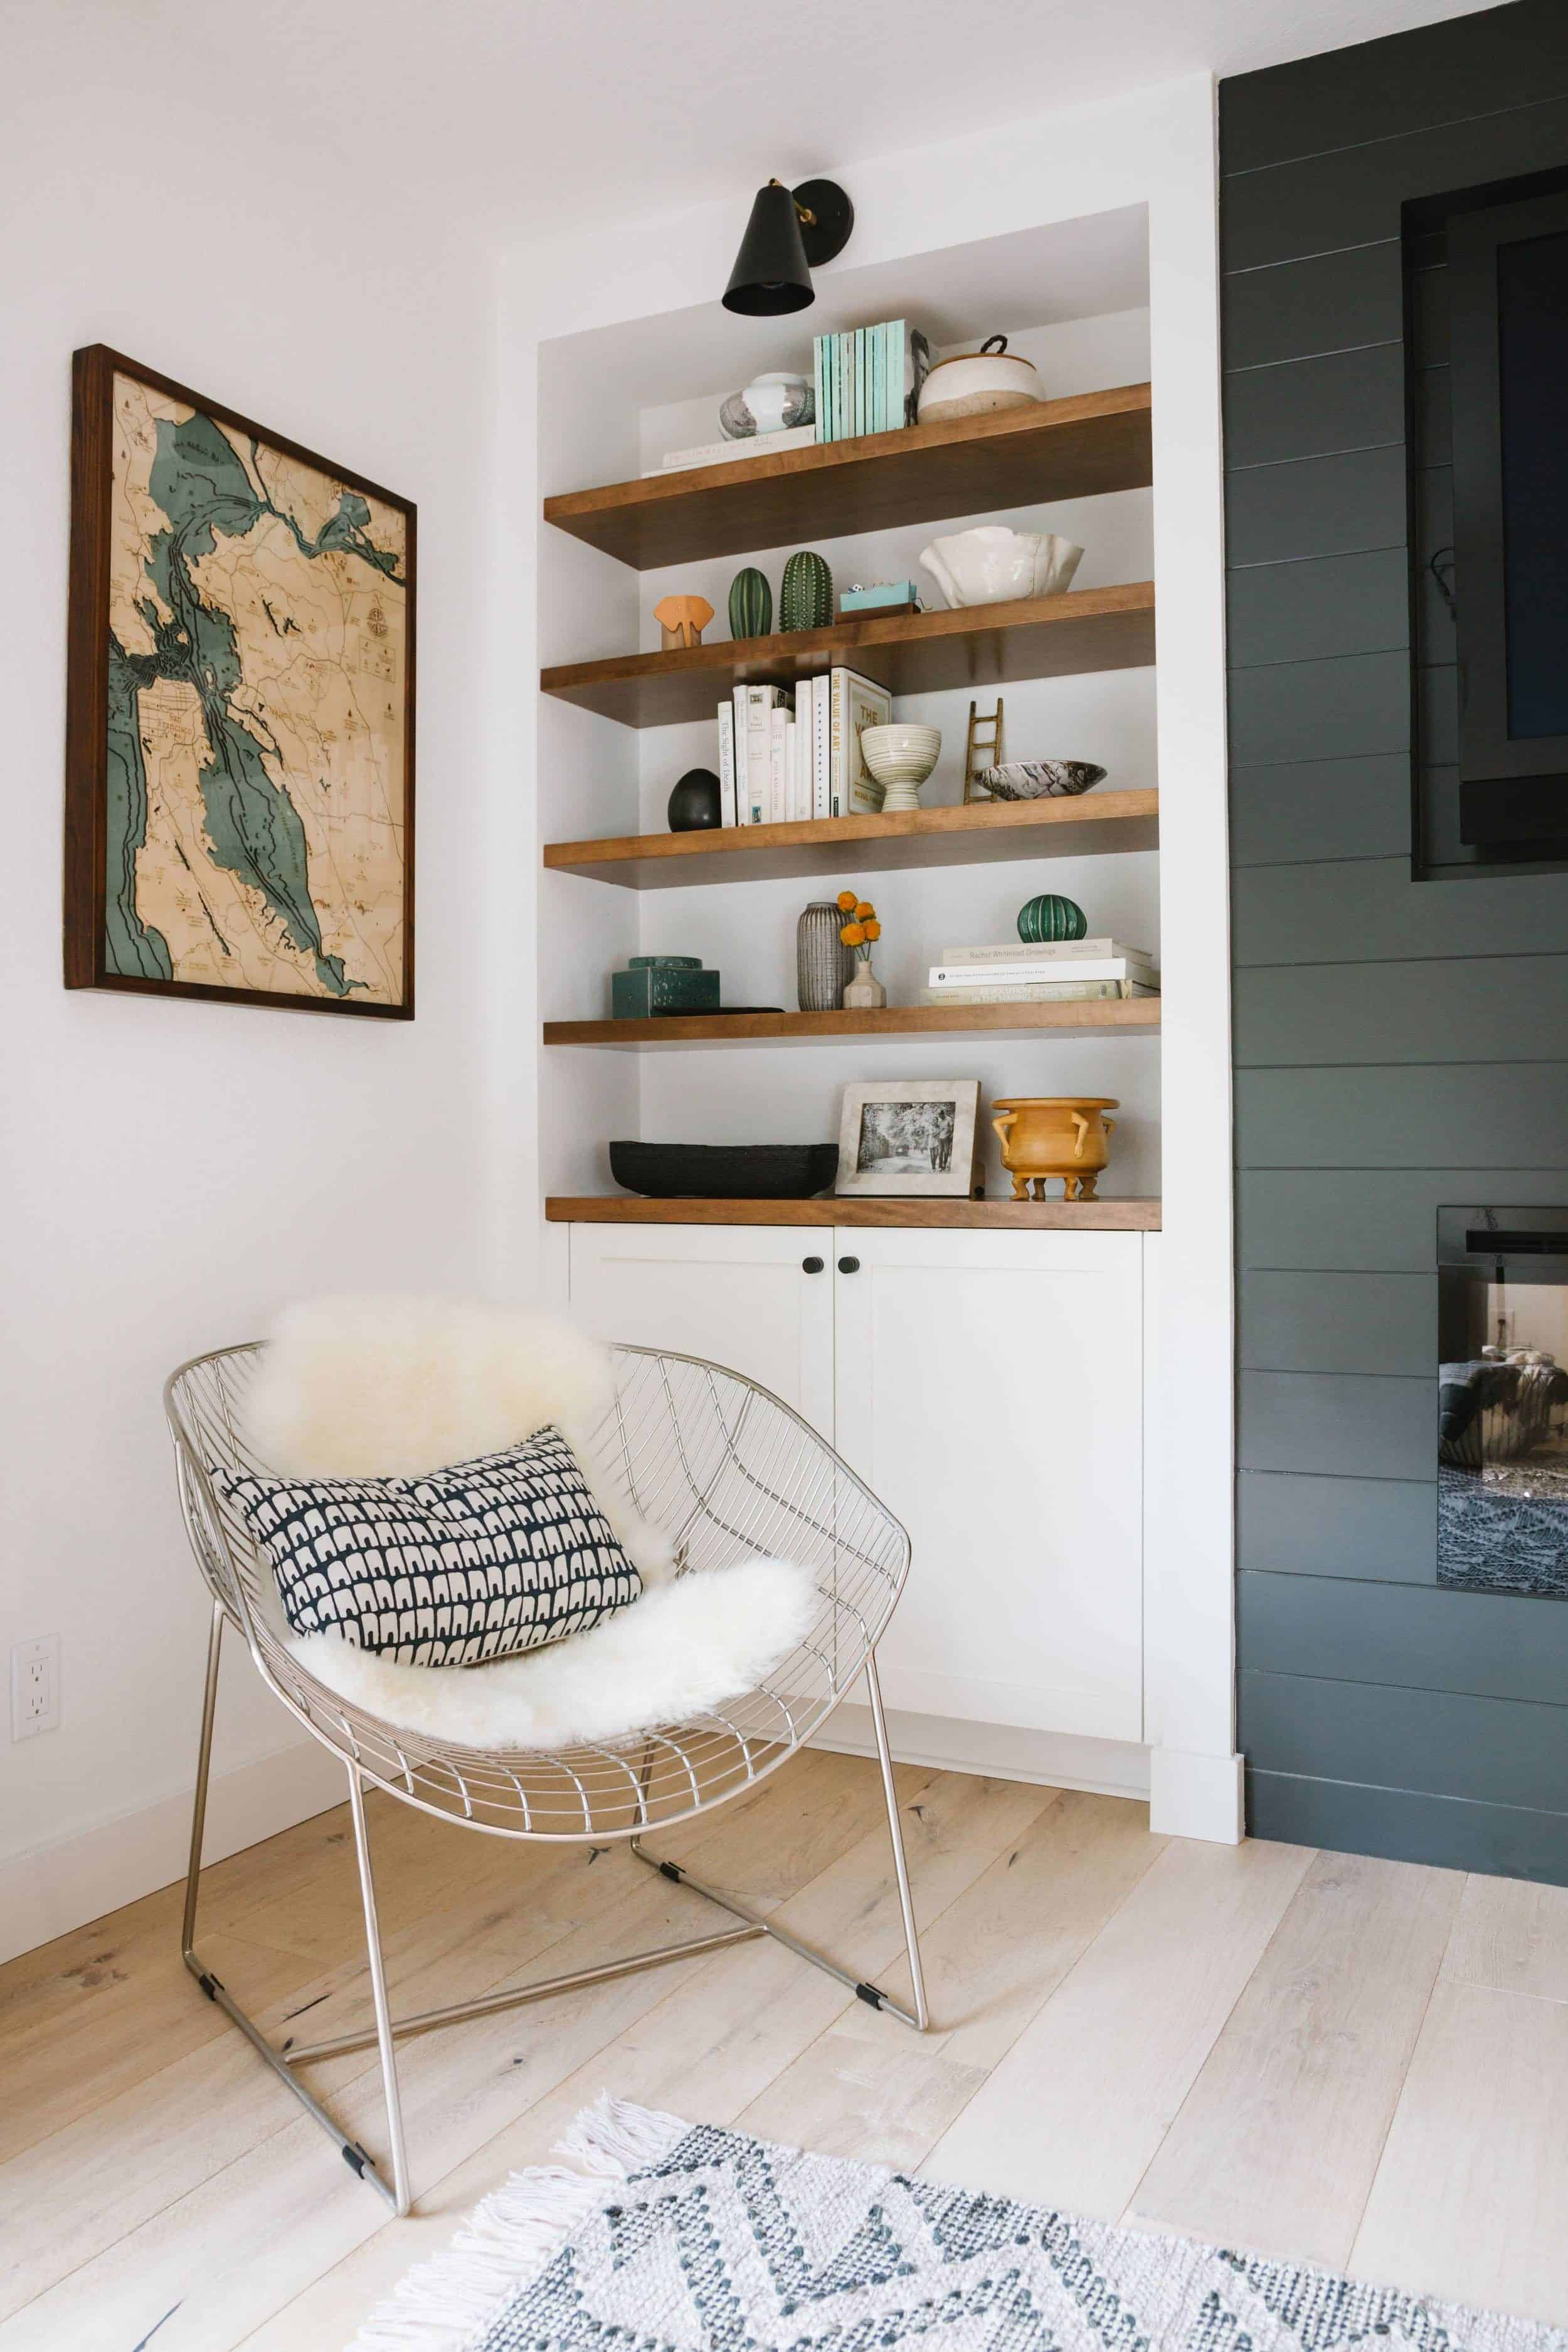 Shiplap Fireplace and Open Shelving